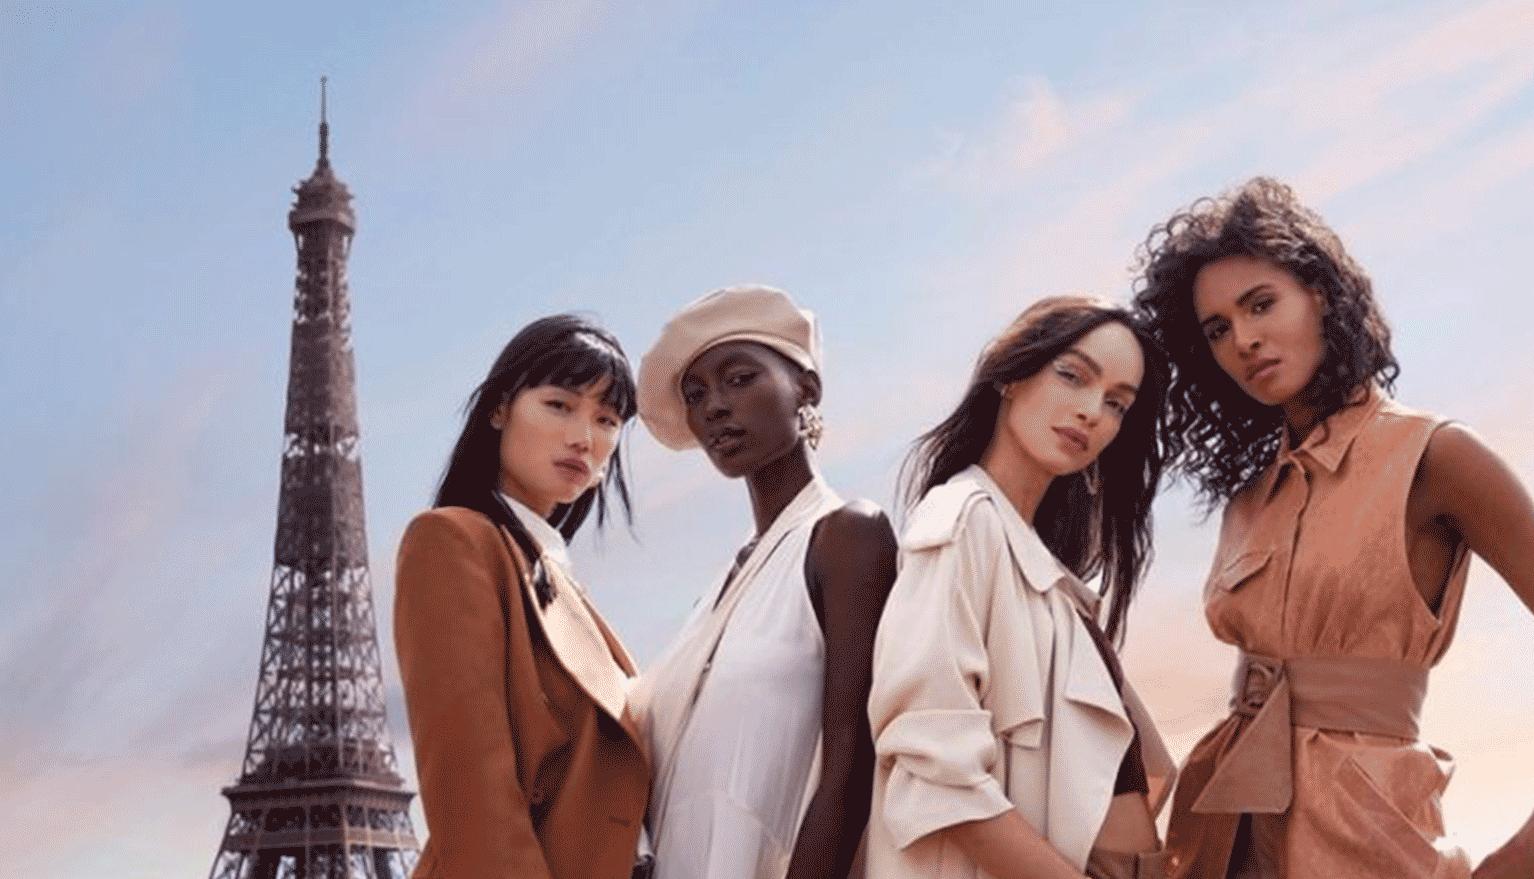 To diversity αναζητούν οι καταναλωτές στις διαφημίσεις ομορφιάς